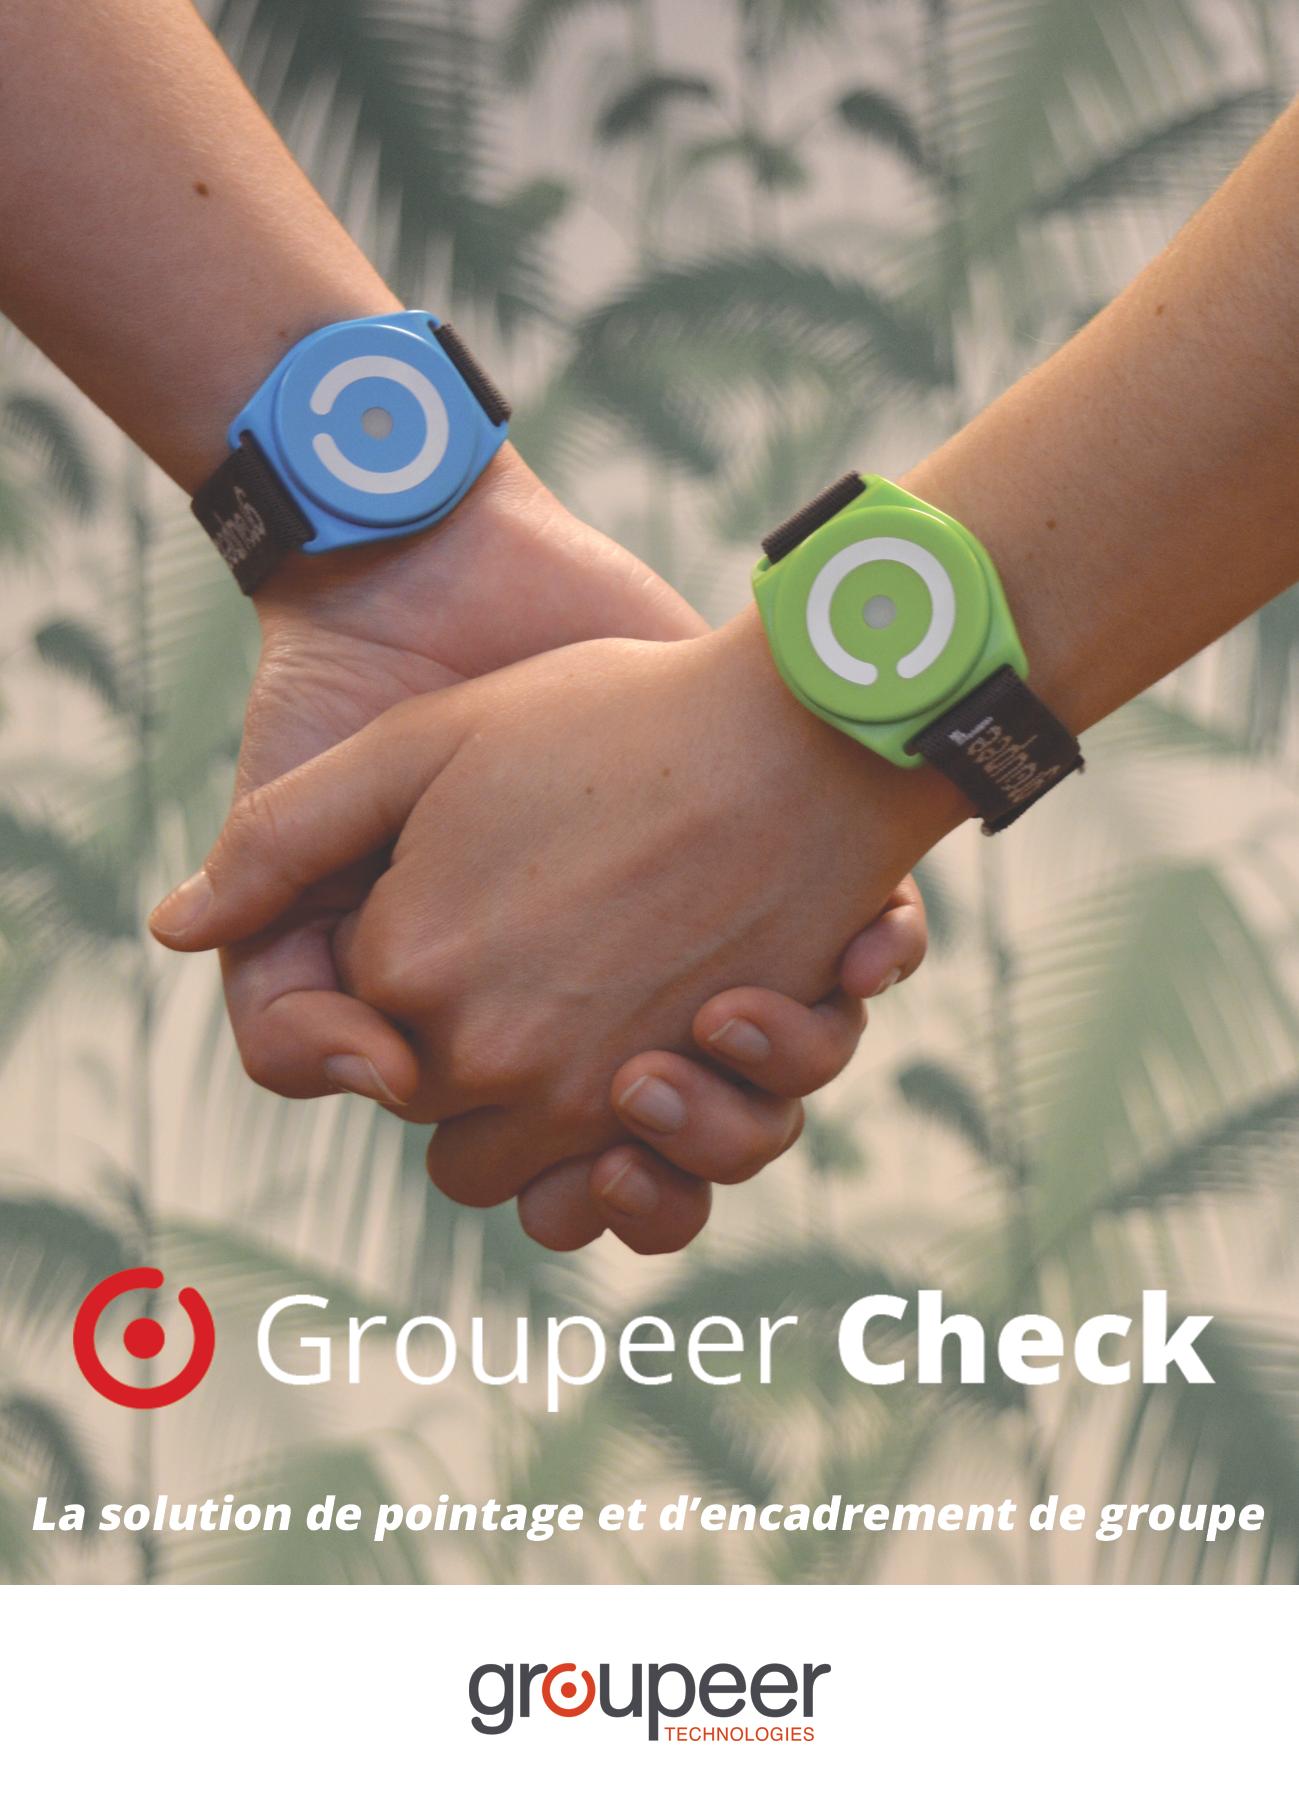 Solution Groupeer Crédit : Groupeer